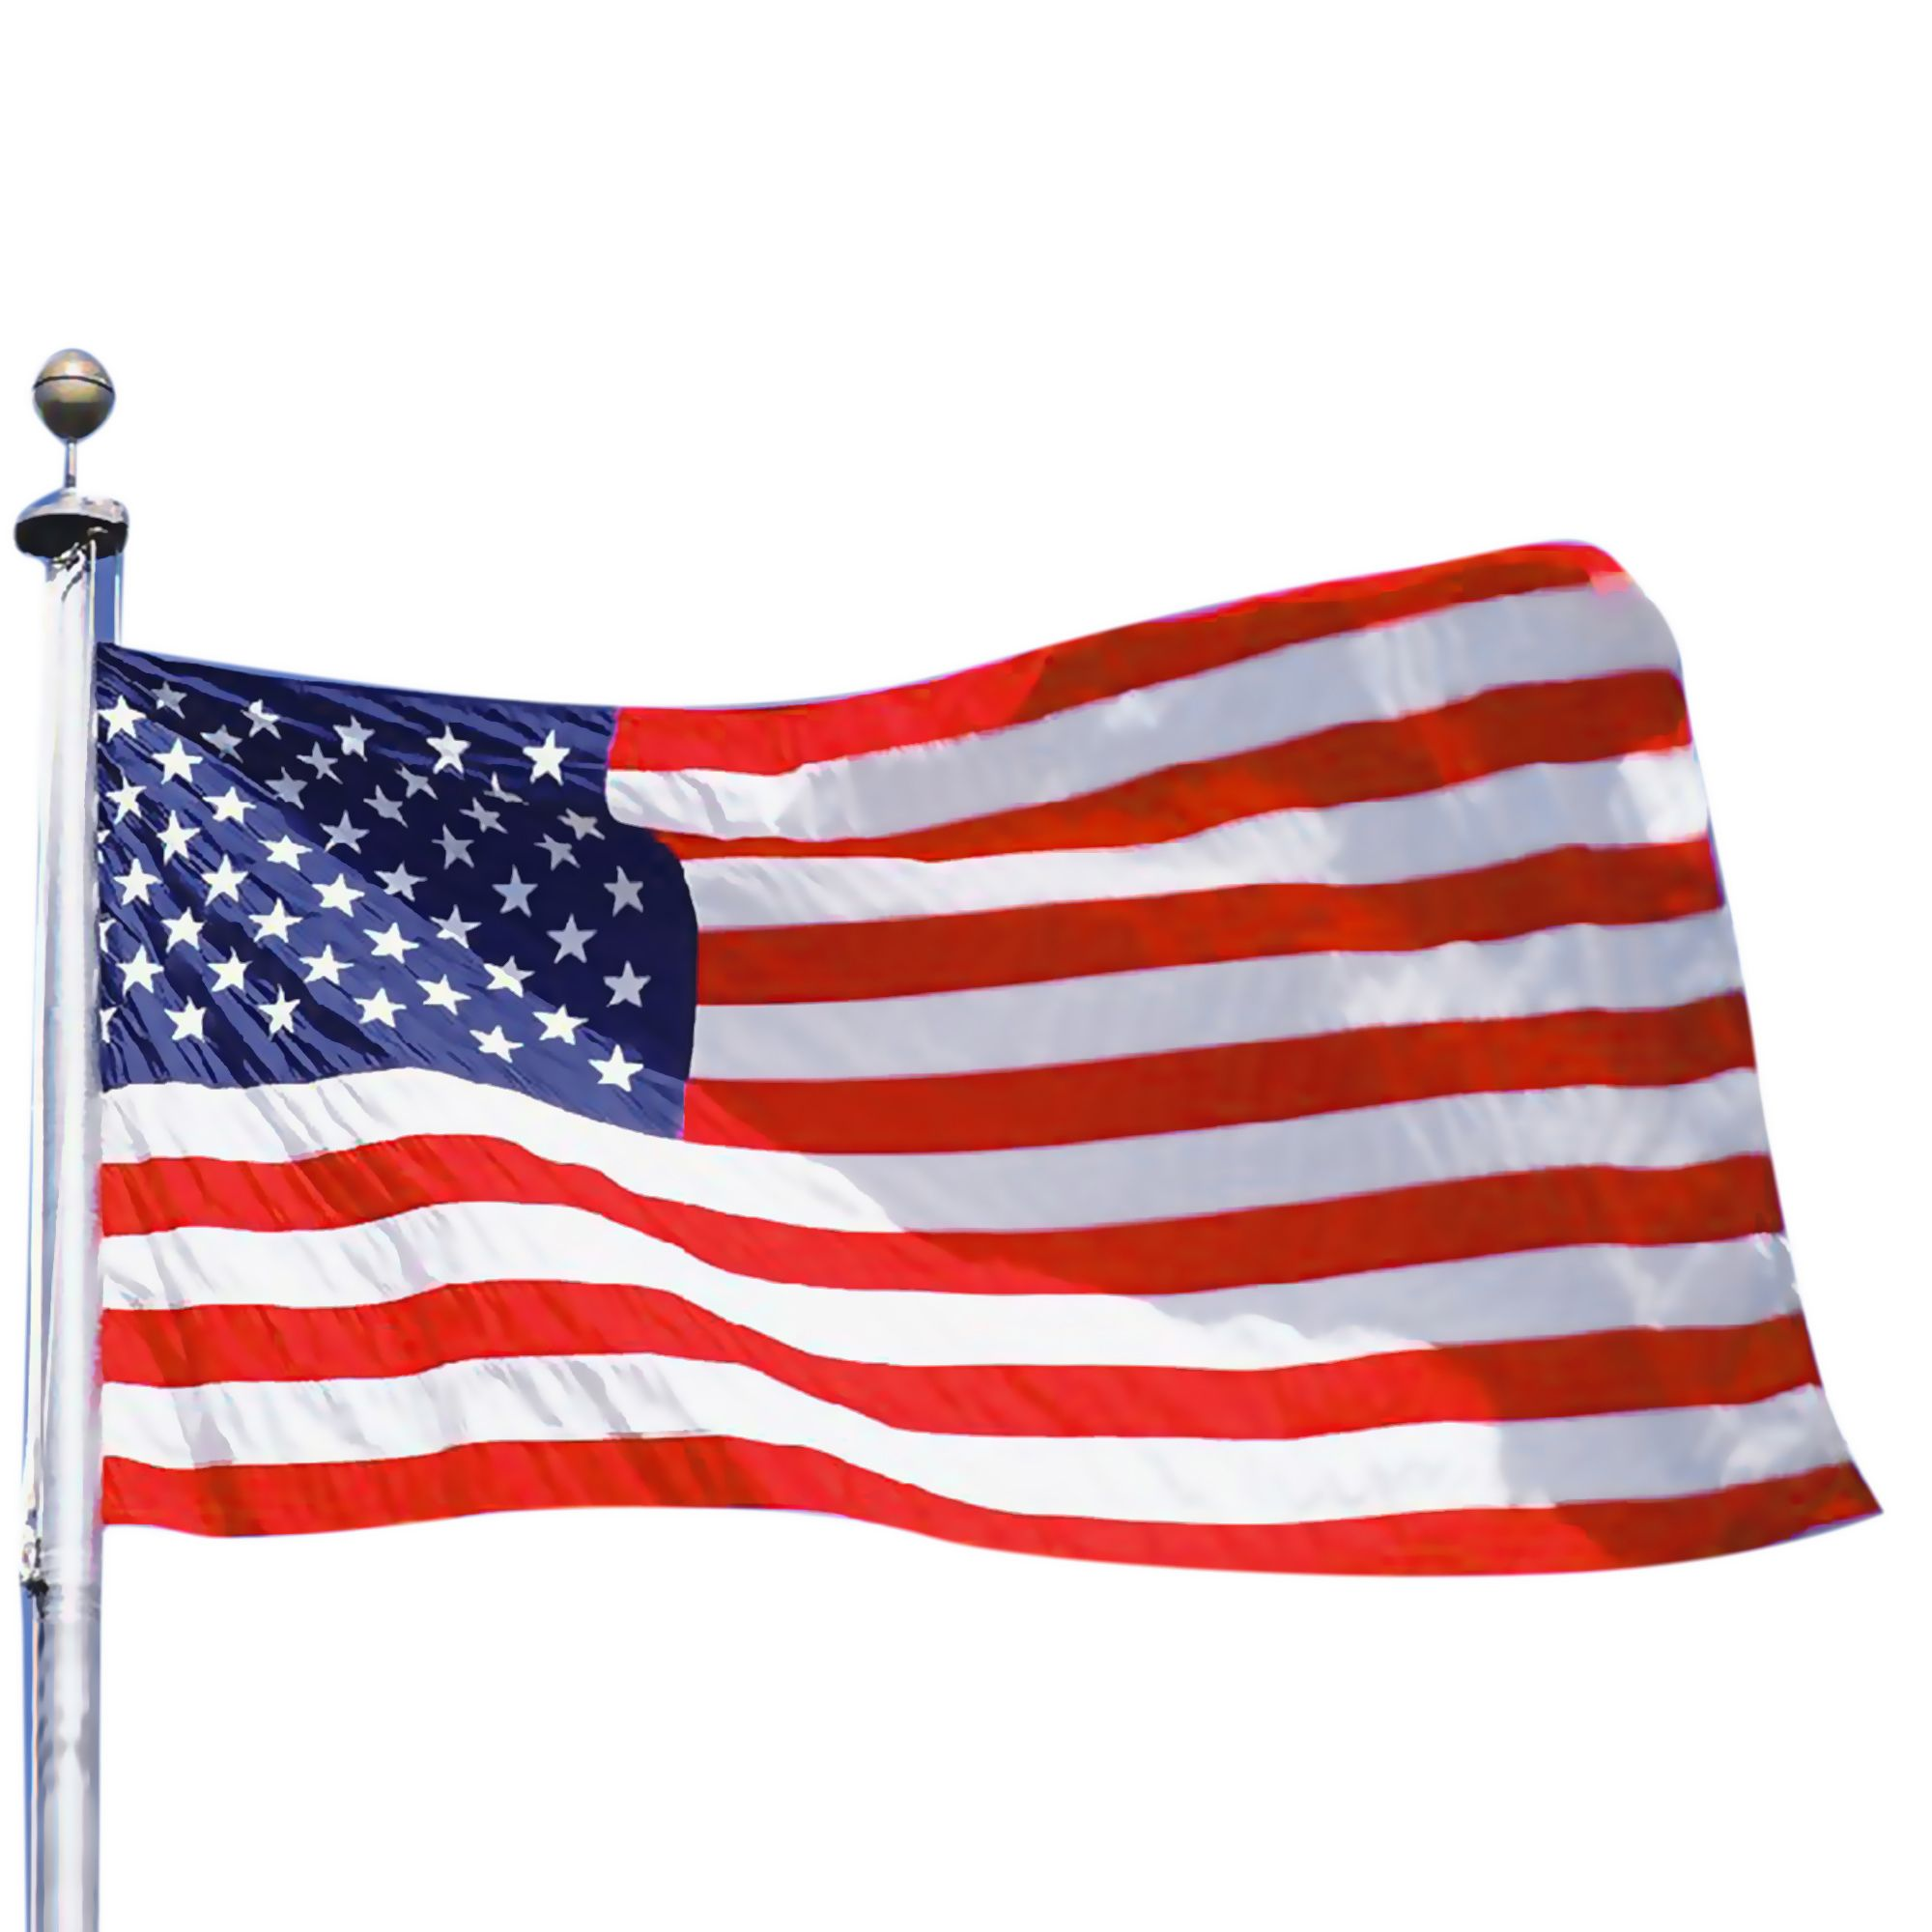 Insten 3' x 5' ft. 3x5 Feet USA US U.S. American Flag Stars Grommets America United States Polyester